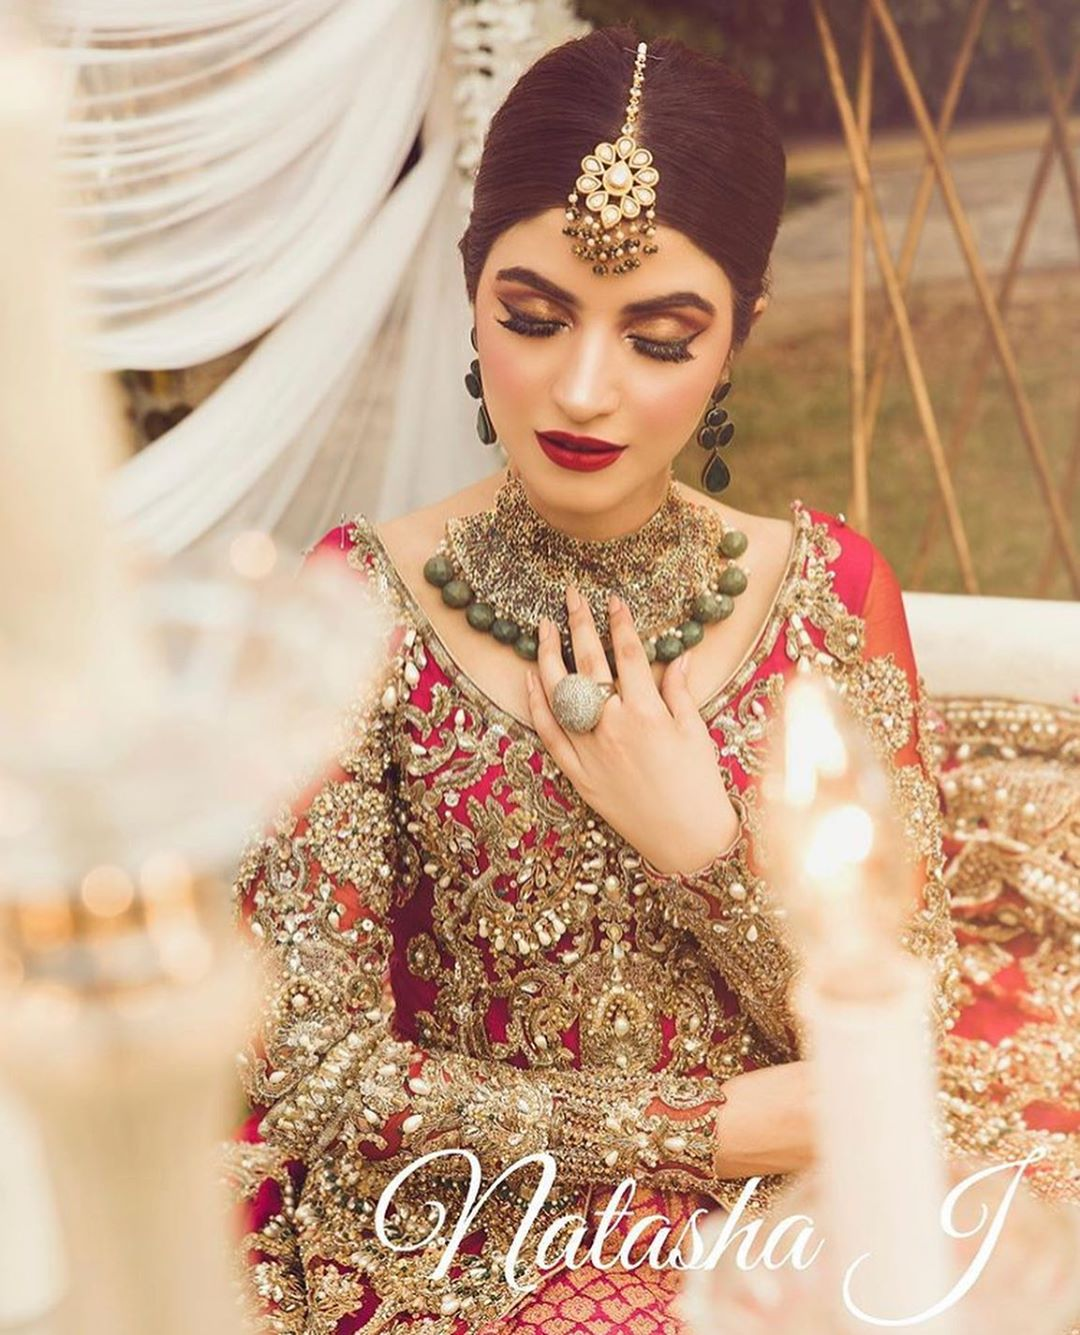 New Beautiful Bridal Photo Shoot of Actress Kinza Hashmi